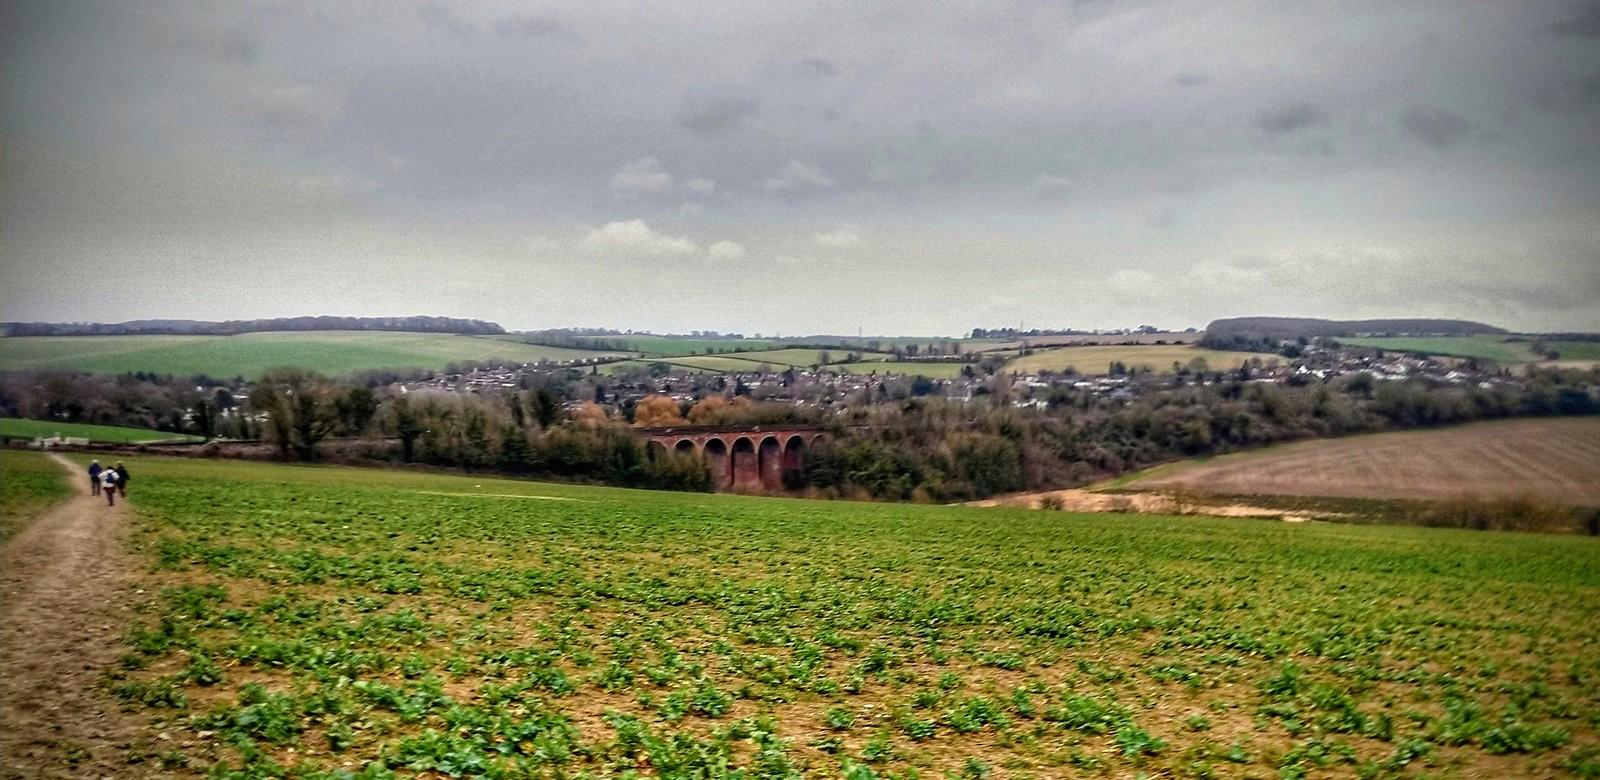 Eynsford - Darent Valley cutting through the North Downs